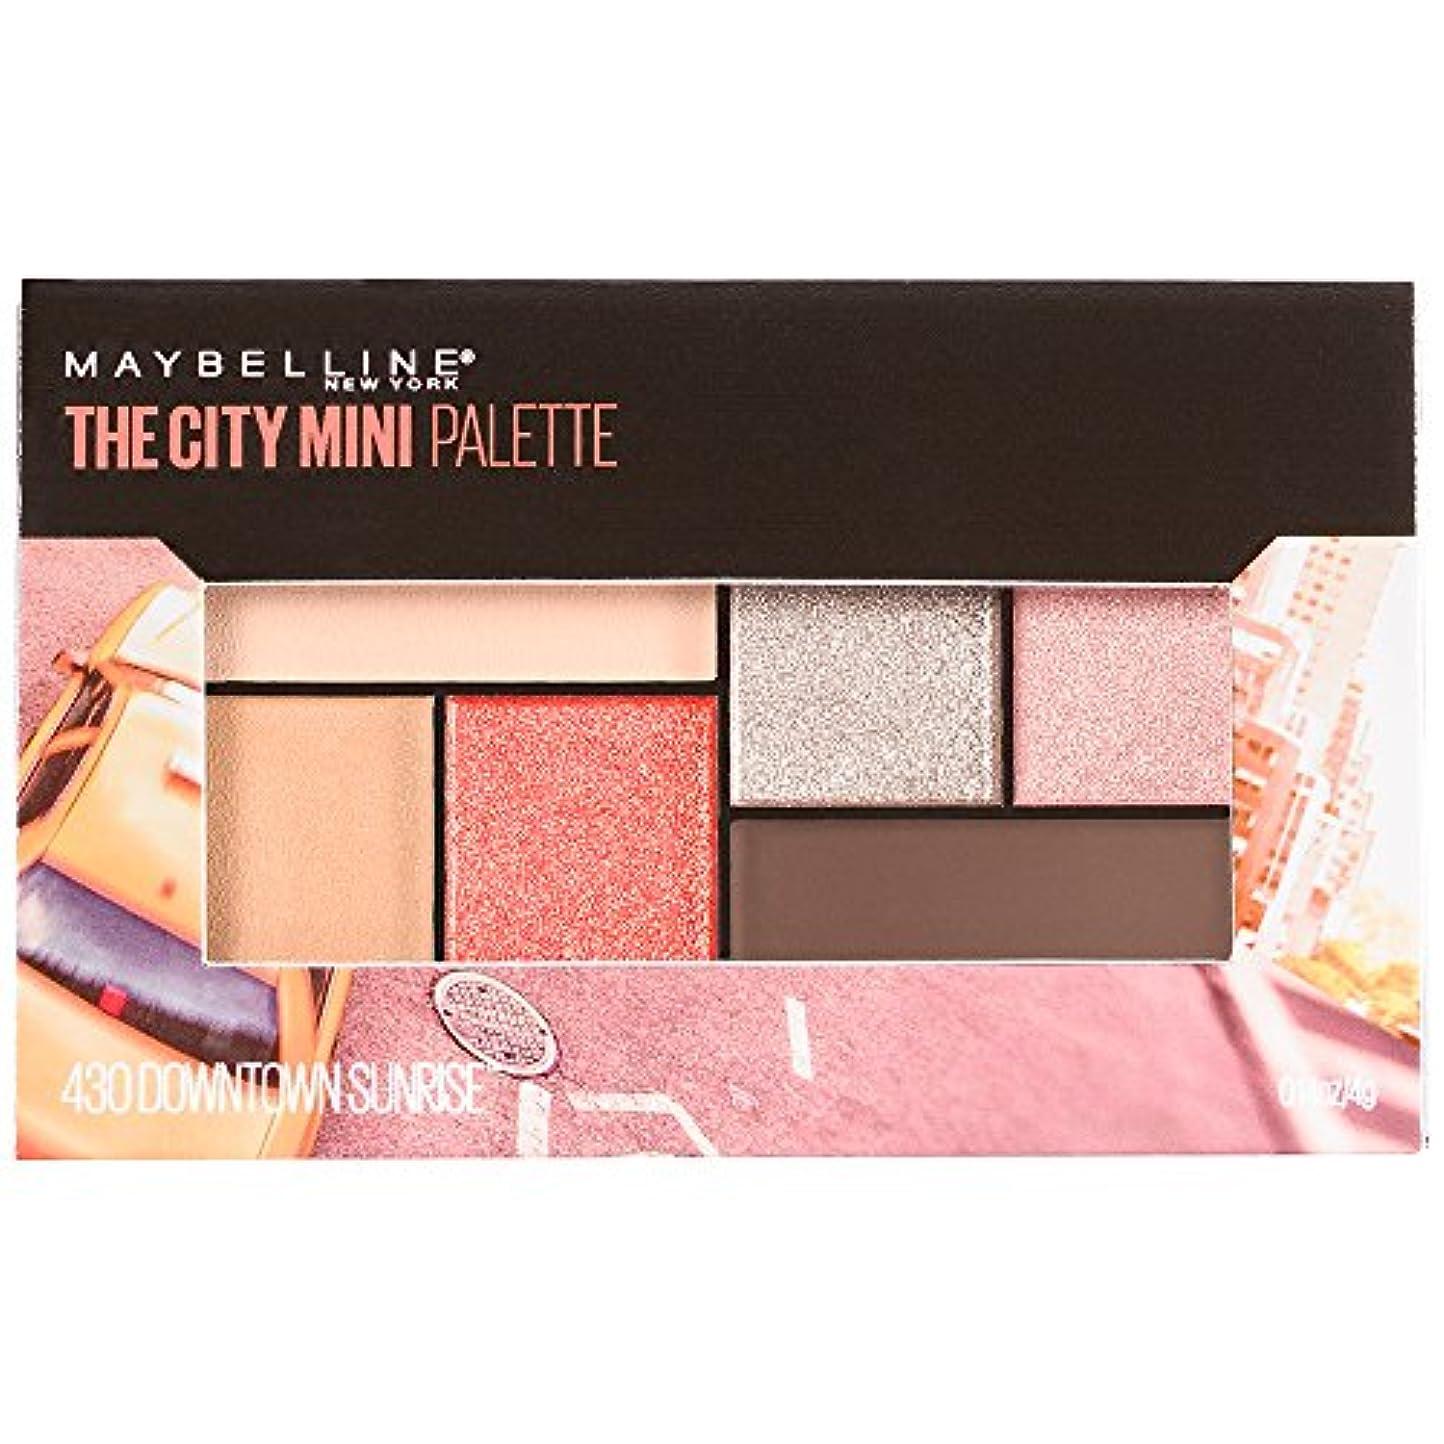 MAYBELLINE The City Mini Palette - Downtown Sunrise (並行輸入品)